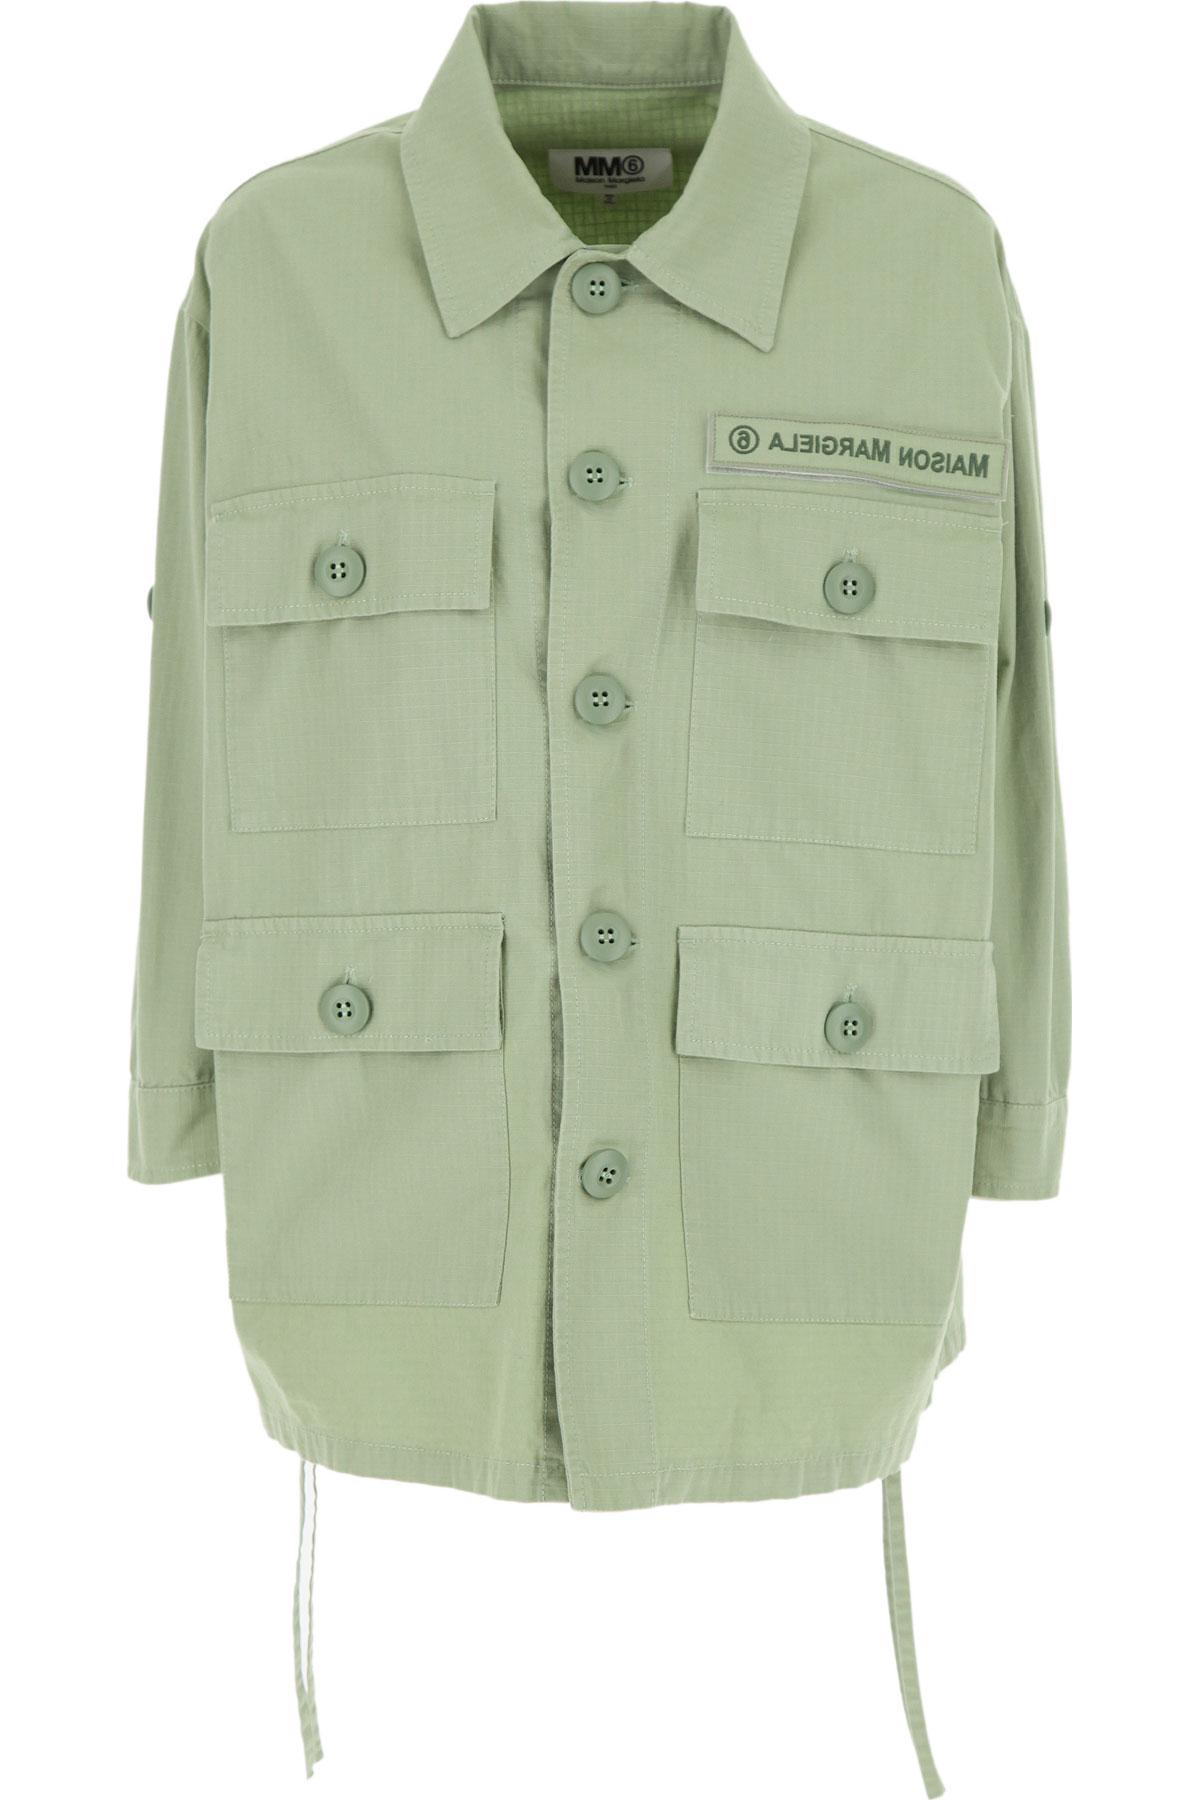 Maison Martin Margiela Jacket for Women On Sale, Mint Green, Cotton, 2019, 4 6